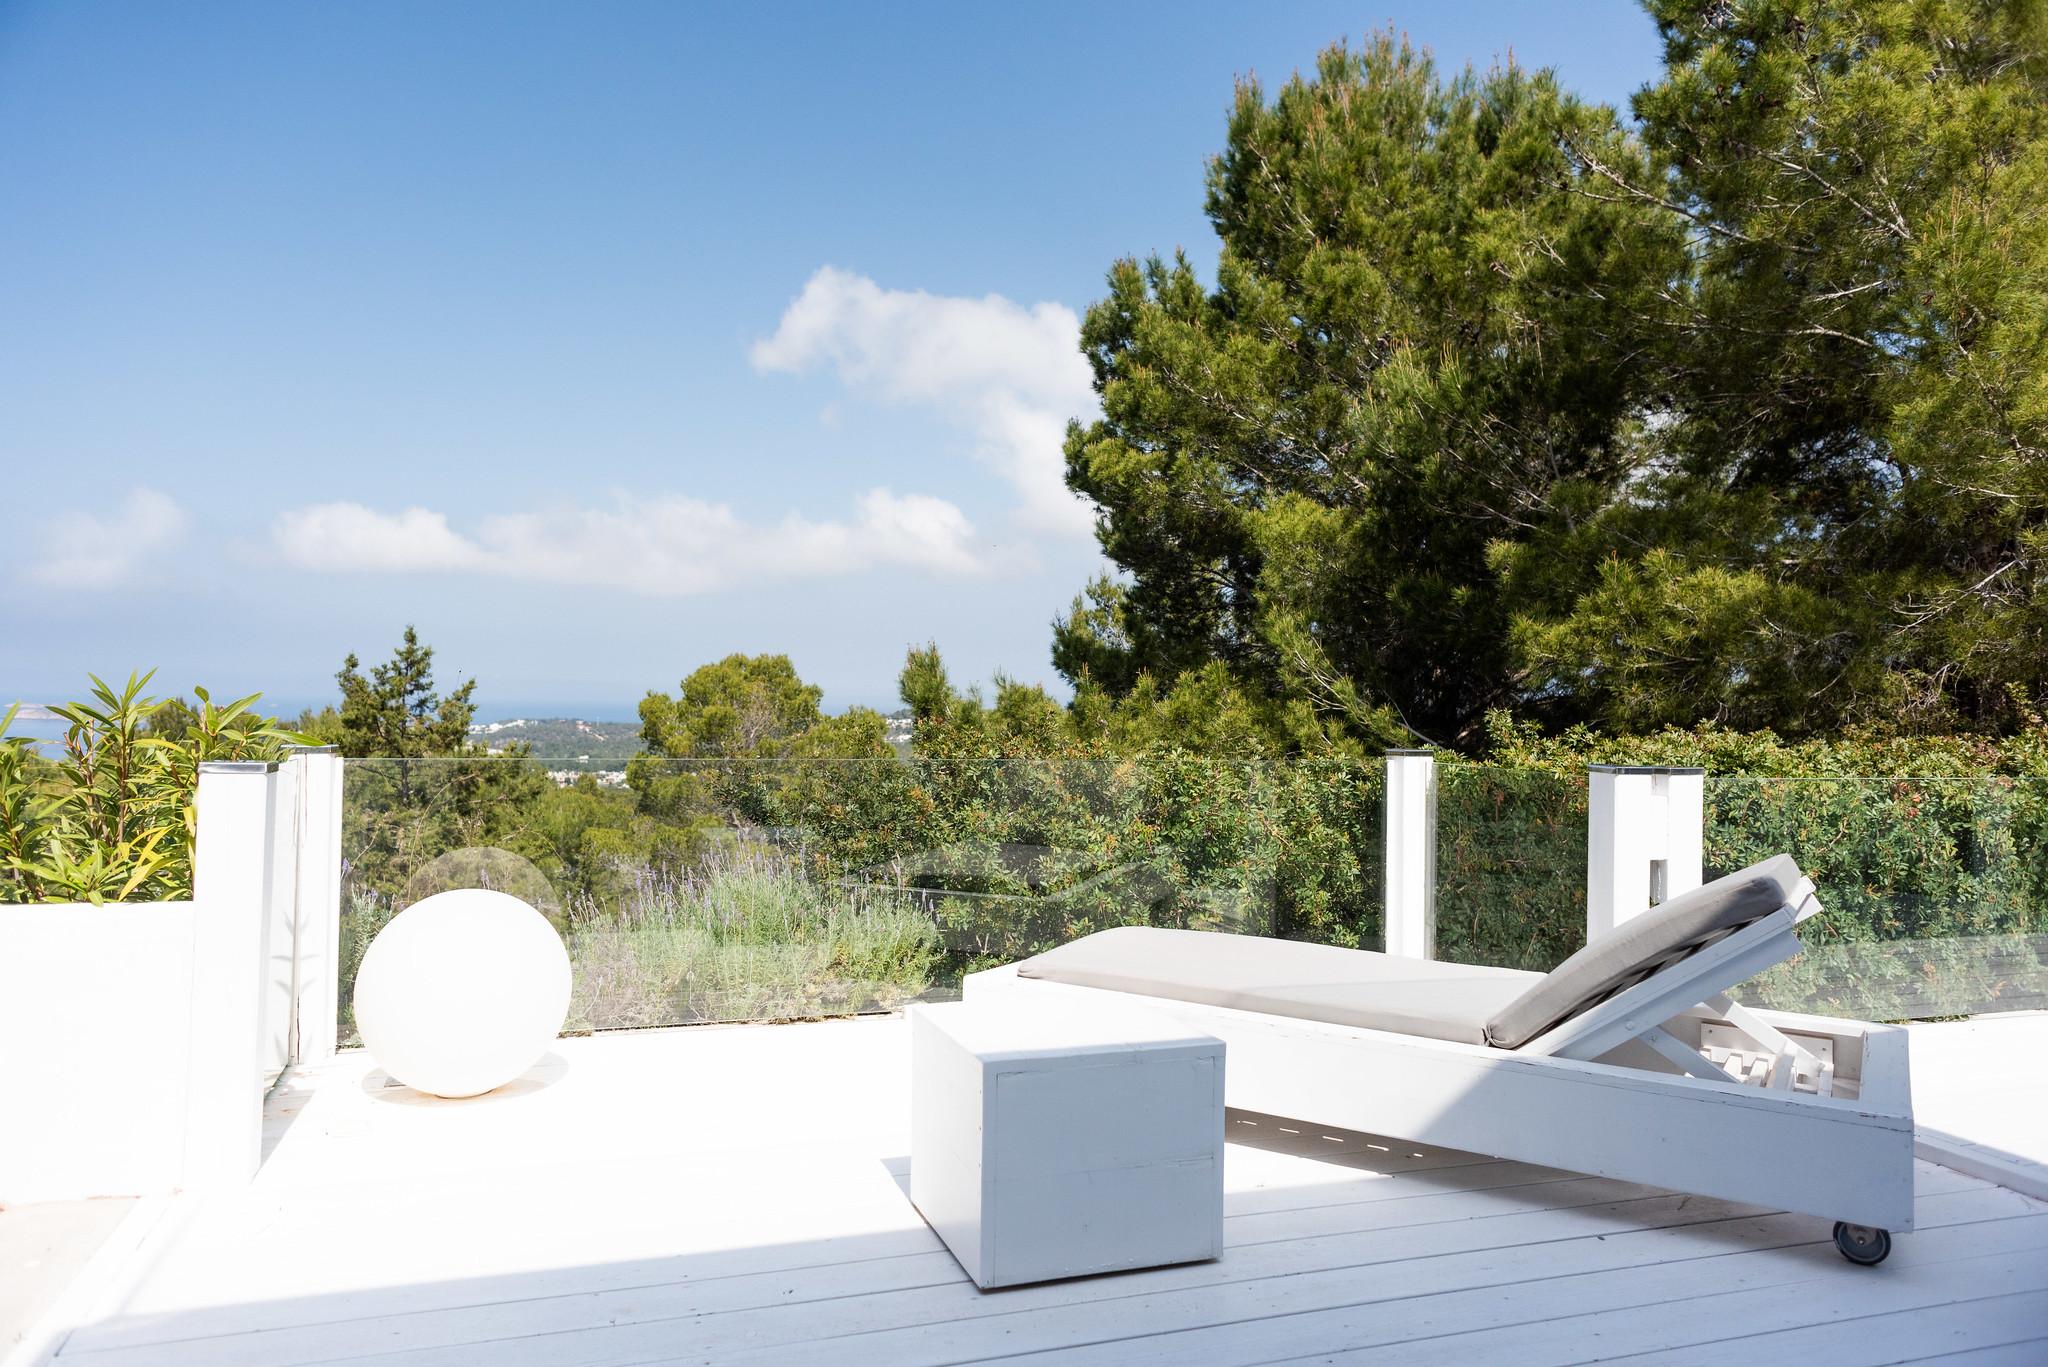 https://www.white-ibiza.com/wp-content/uploads/2020/05/white-ibiza-villas-can-dela-sunspot.jpg